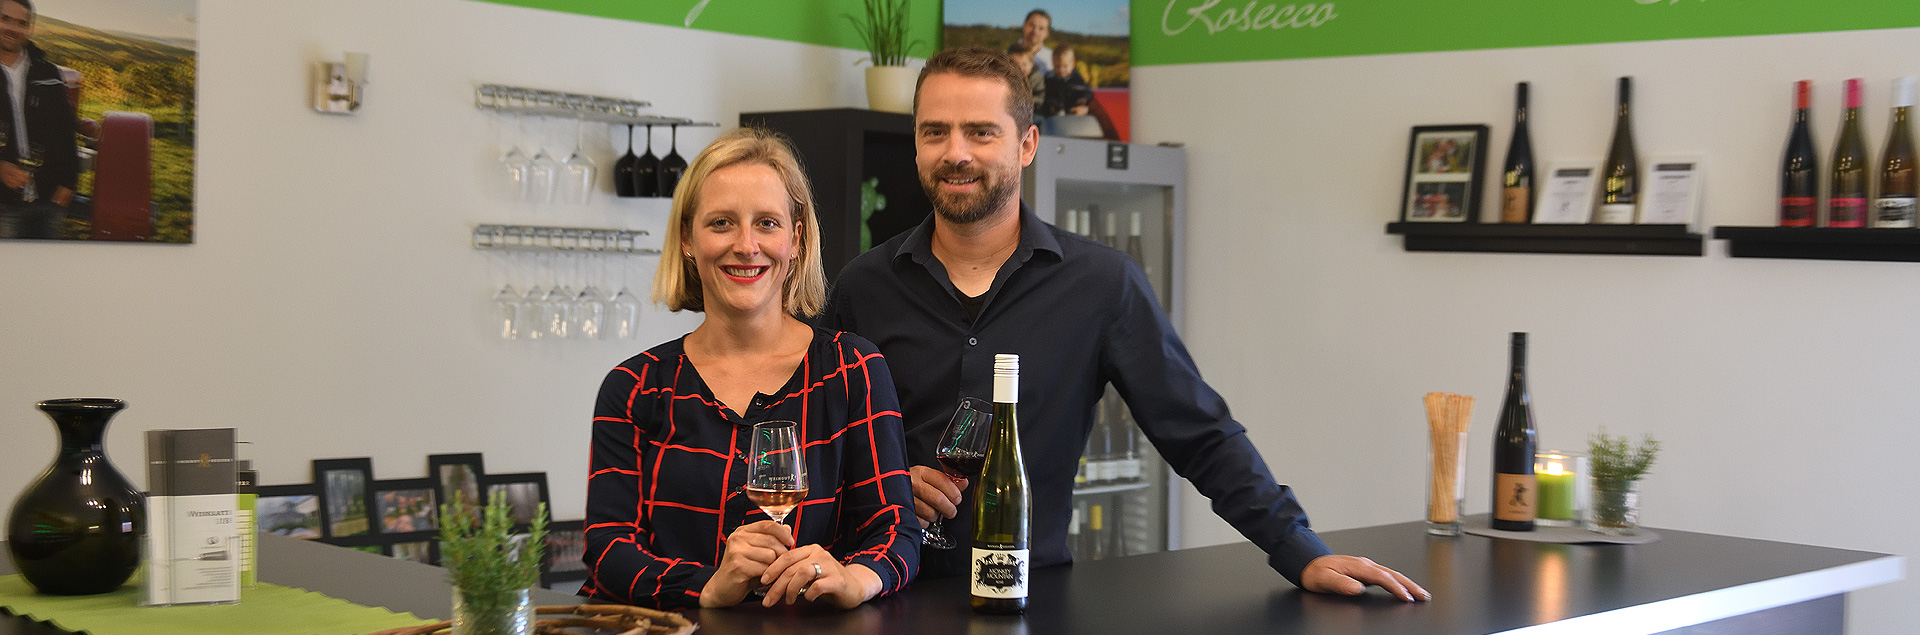 Weingut Pfeiffer in Gau-Algesheim